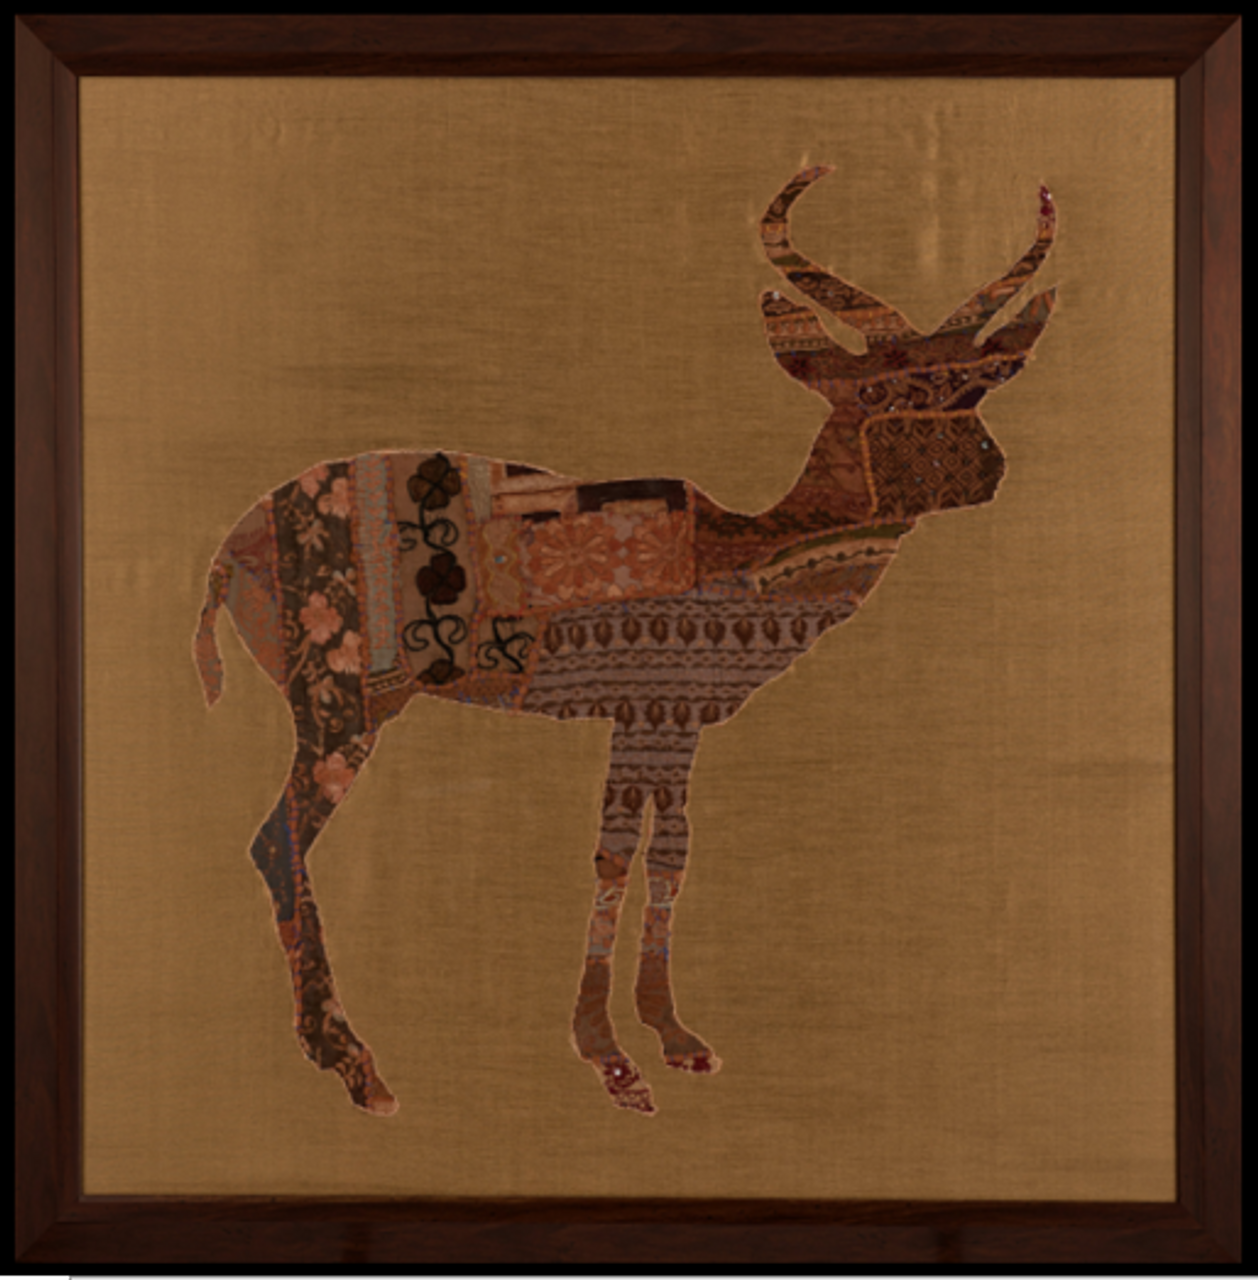 The Dainty Deer Wall Art (ART_3845_24440)   Handpainted Art Painting   41in  X 41in